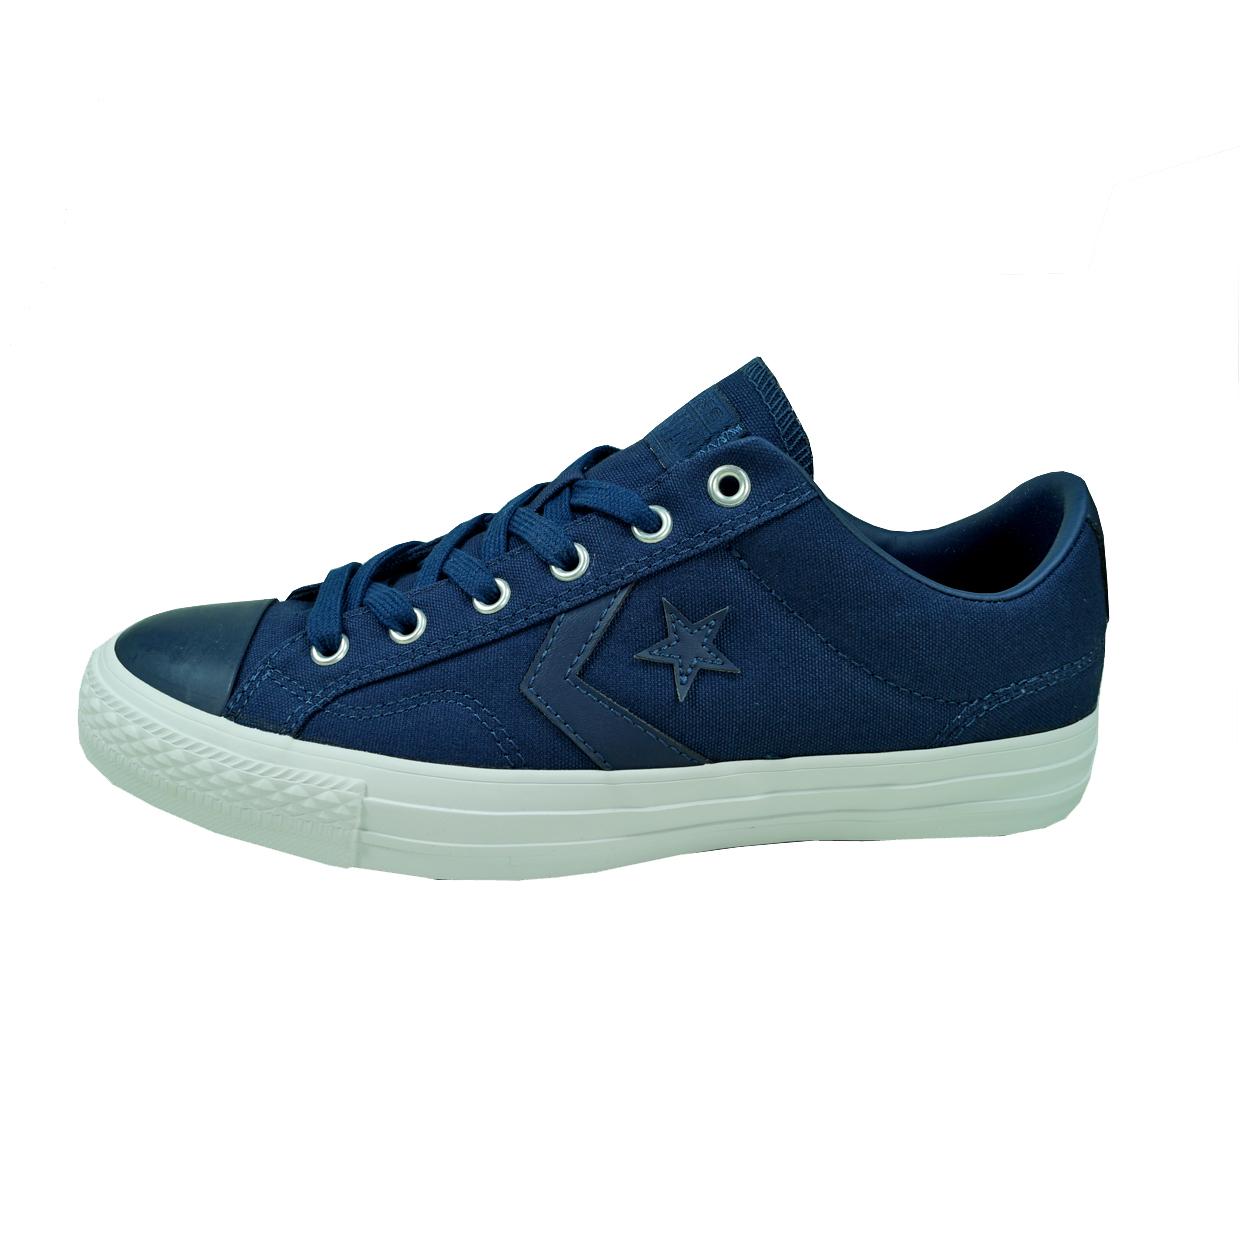 Converse Herren Schuhe Star Player OX Blau 44, 5 Turnschuhe Chucks 157759C